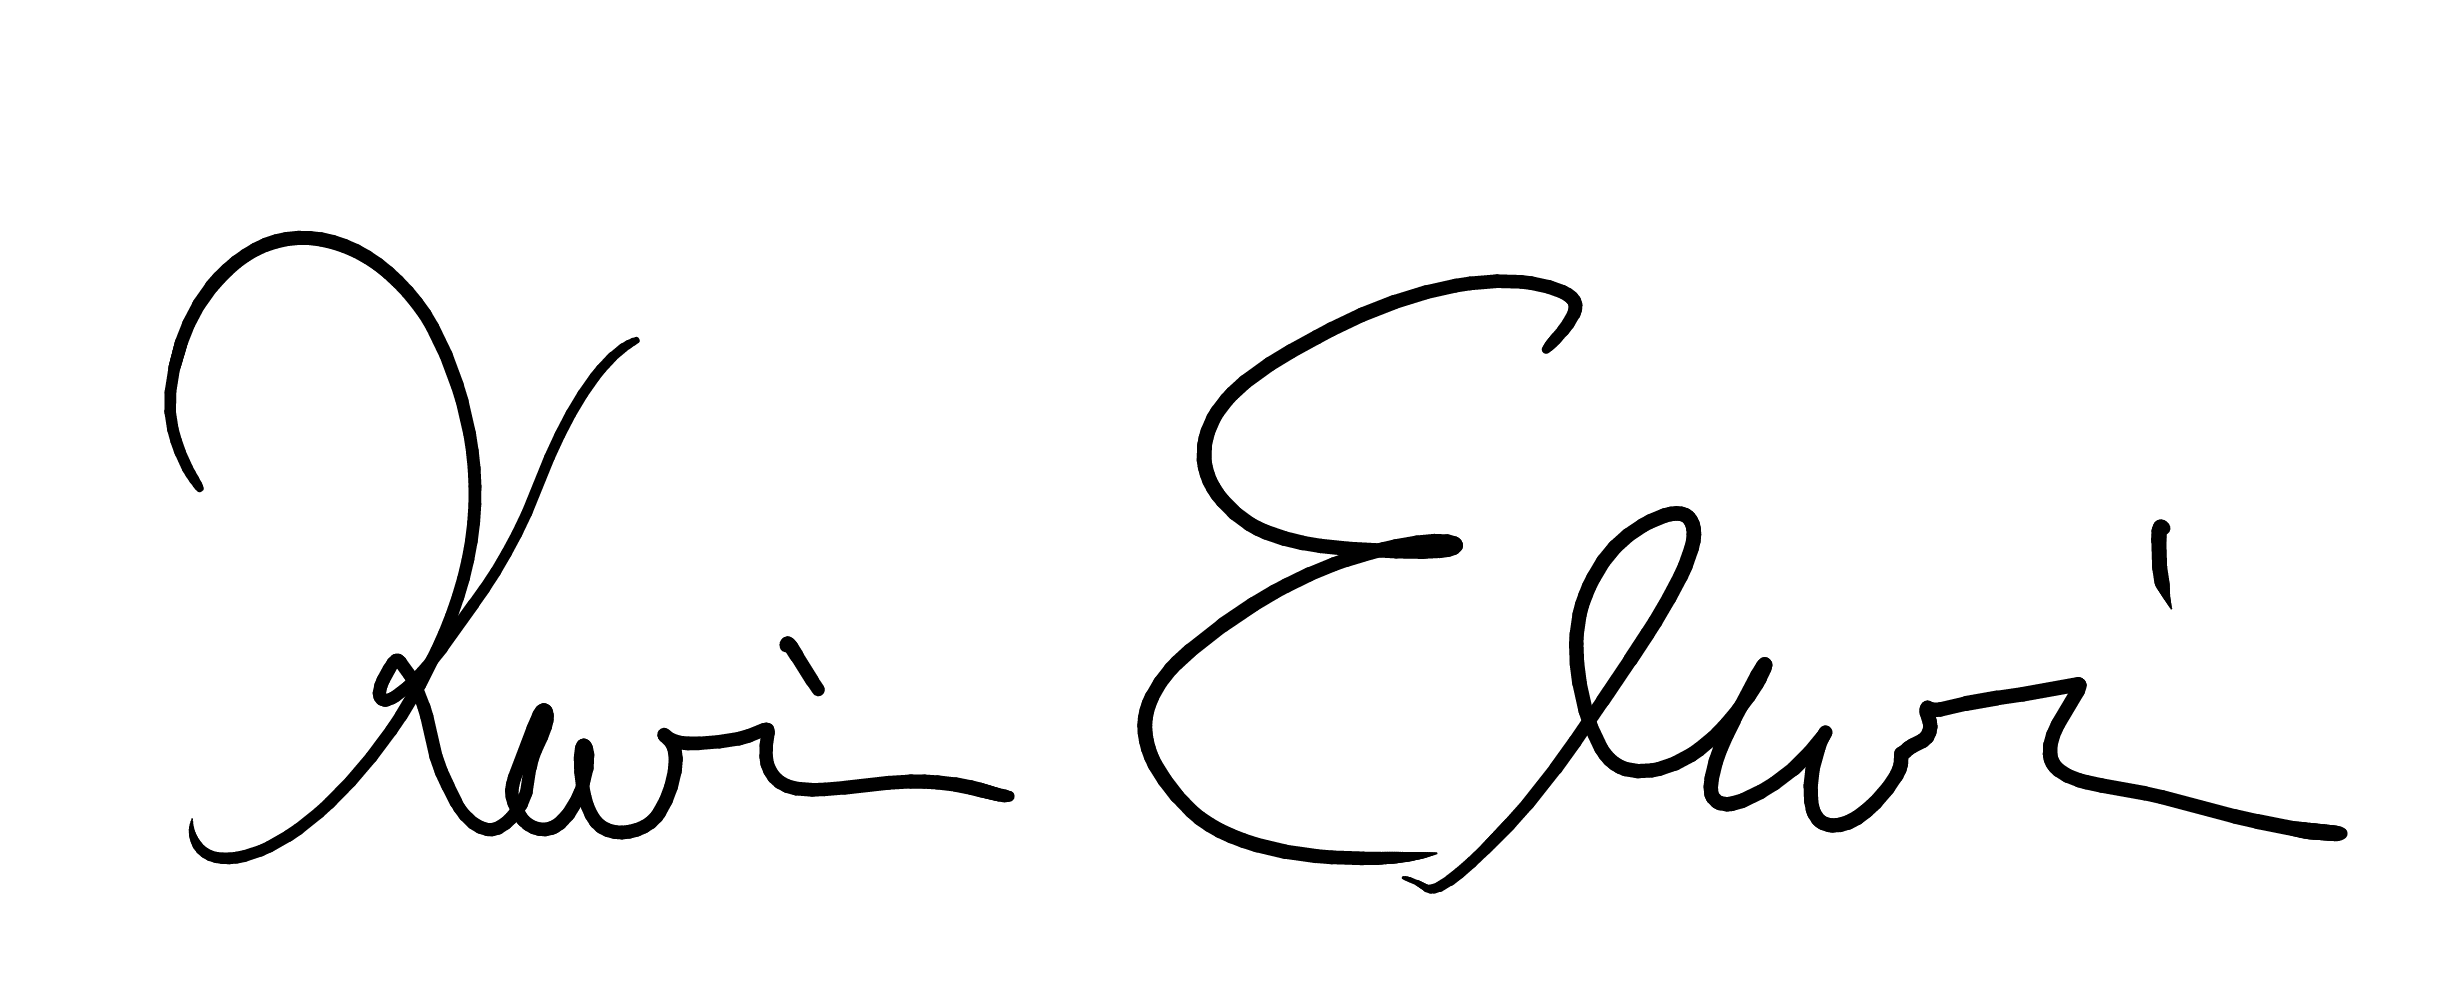 Kevin-Signature.png